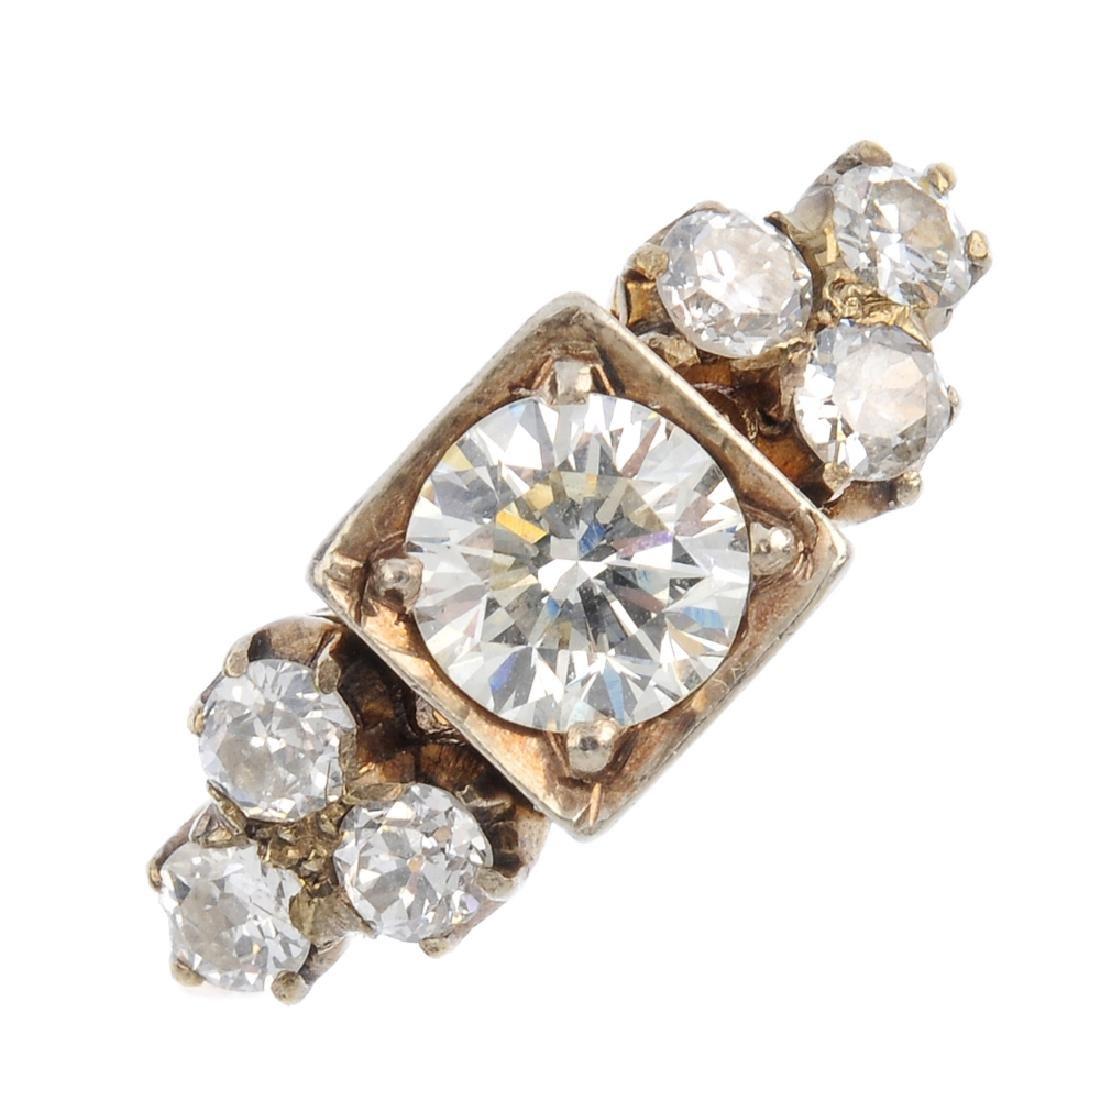 A diamond dress ring. The brilliant-cut diamond, with